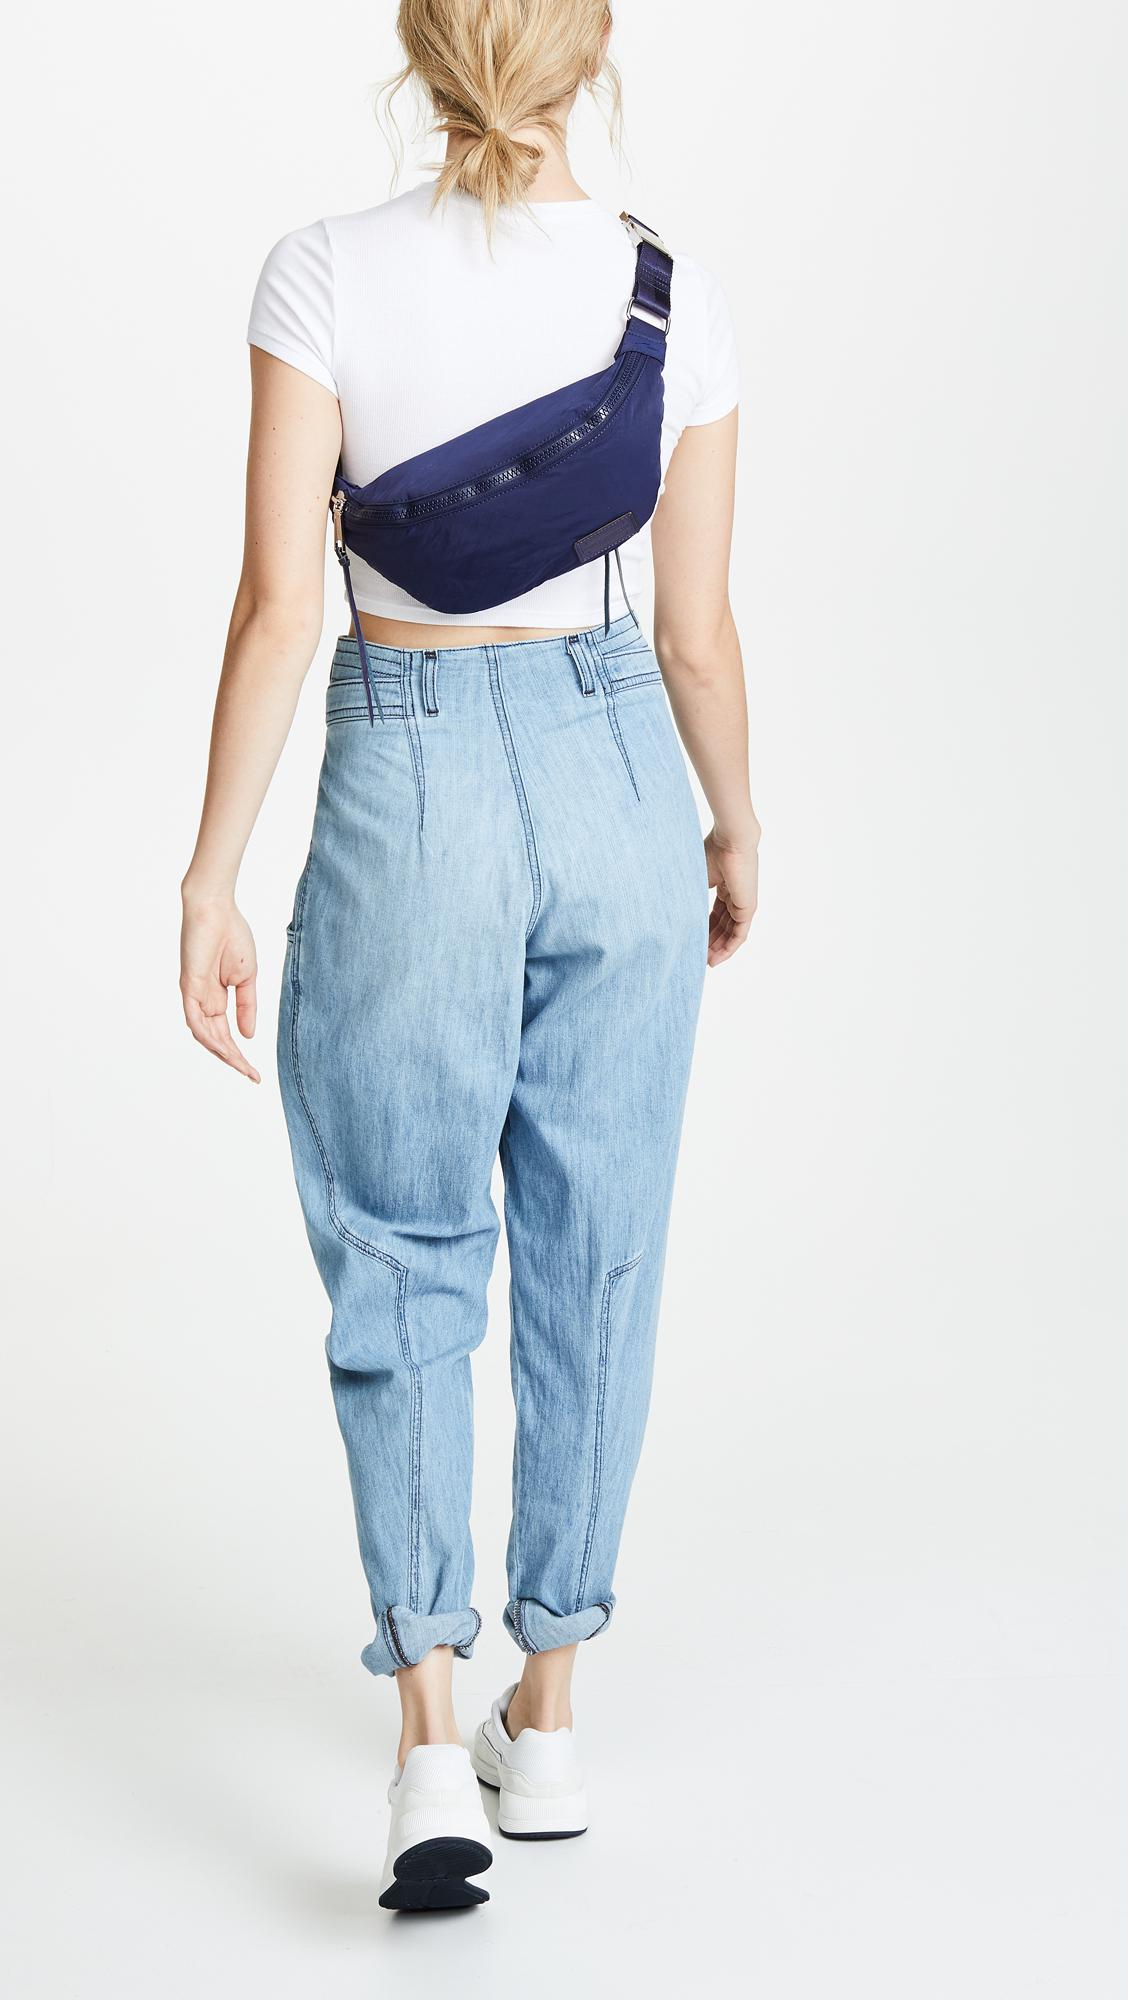 5846f824684 Rebecca Minkoff Nylon Belt Bag in Blue - Lyst